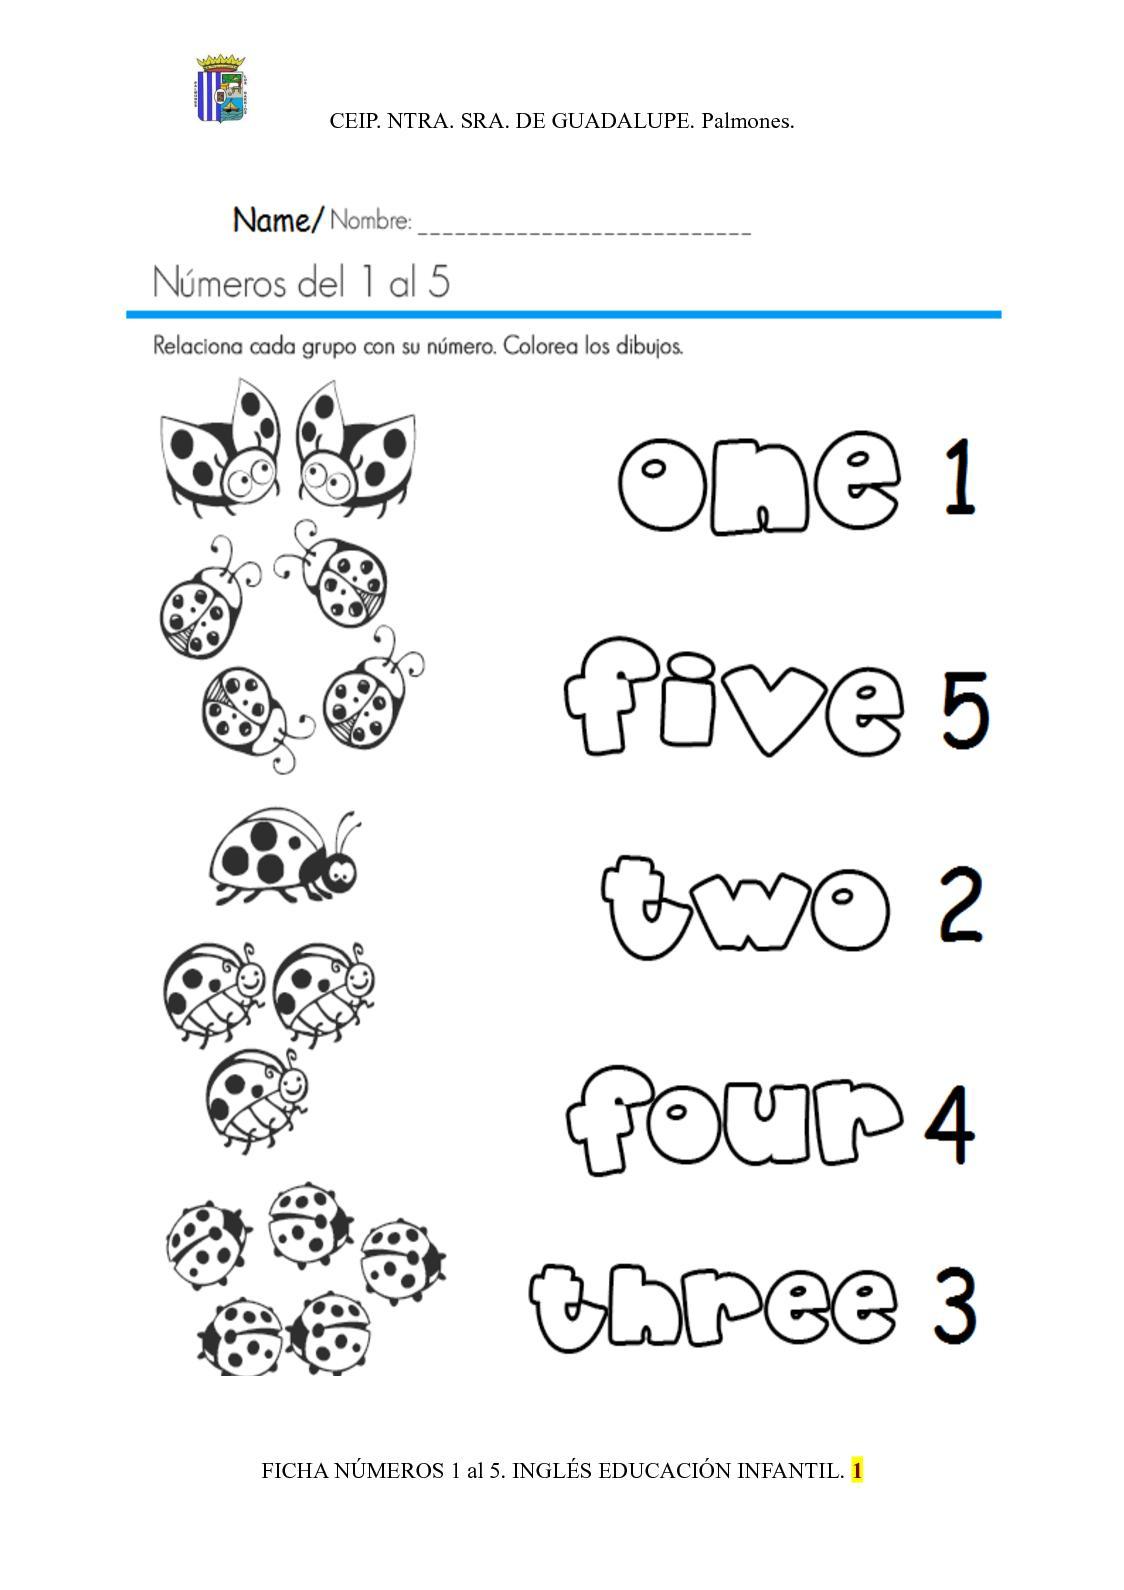 0004503134e8dd03cc85e on Kindergarten Worksheets 5 Se